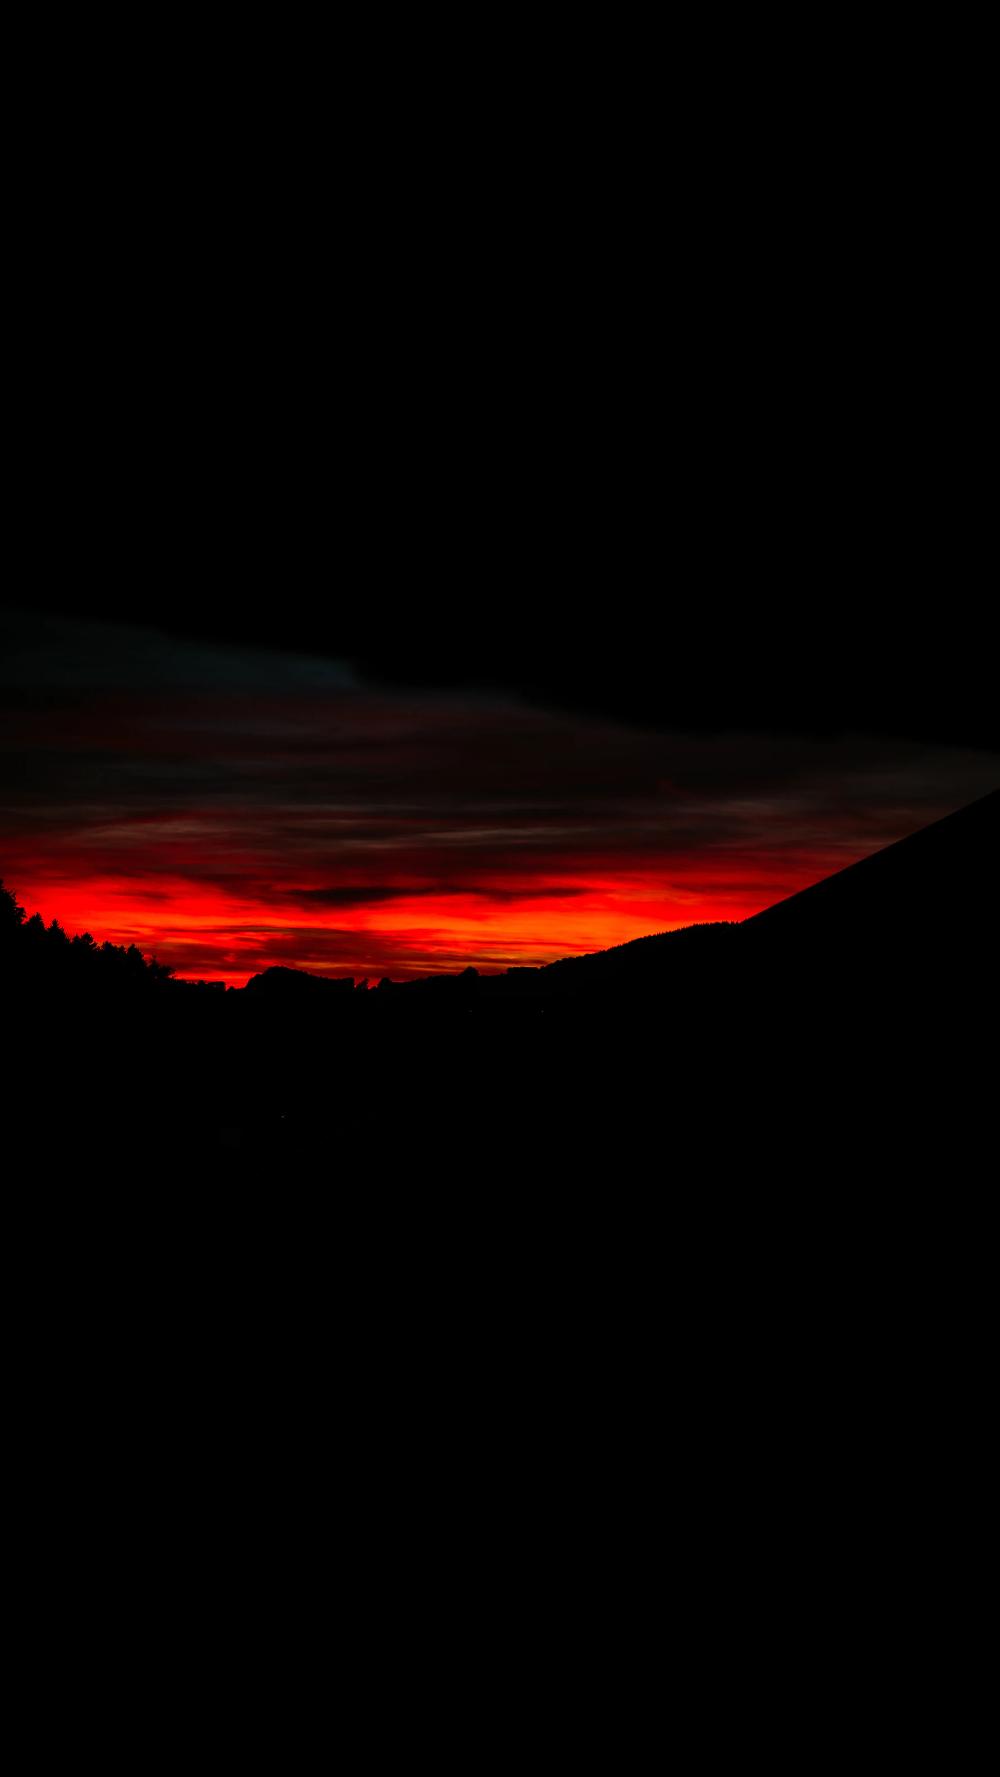 Mountain During Golden Hour Photo Free Nature Image On Unsplash Black Aesthetic Wallpaper Dark Red Wallpaper Red And Black Wallpaper